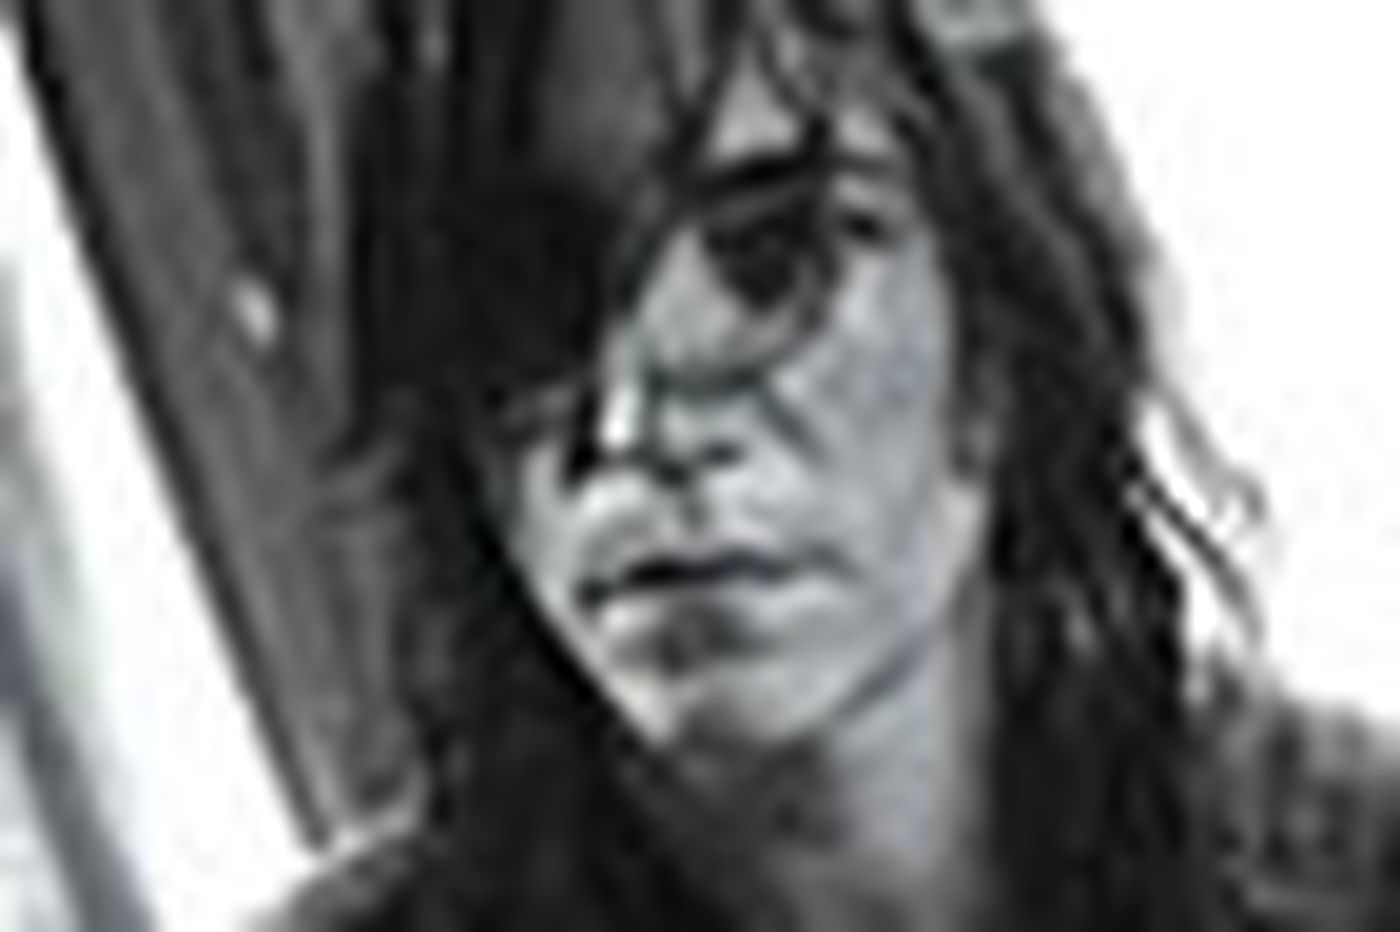 Ellen Gray: Film bio of Patti Smith reveals little, yet entertains